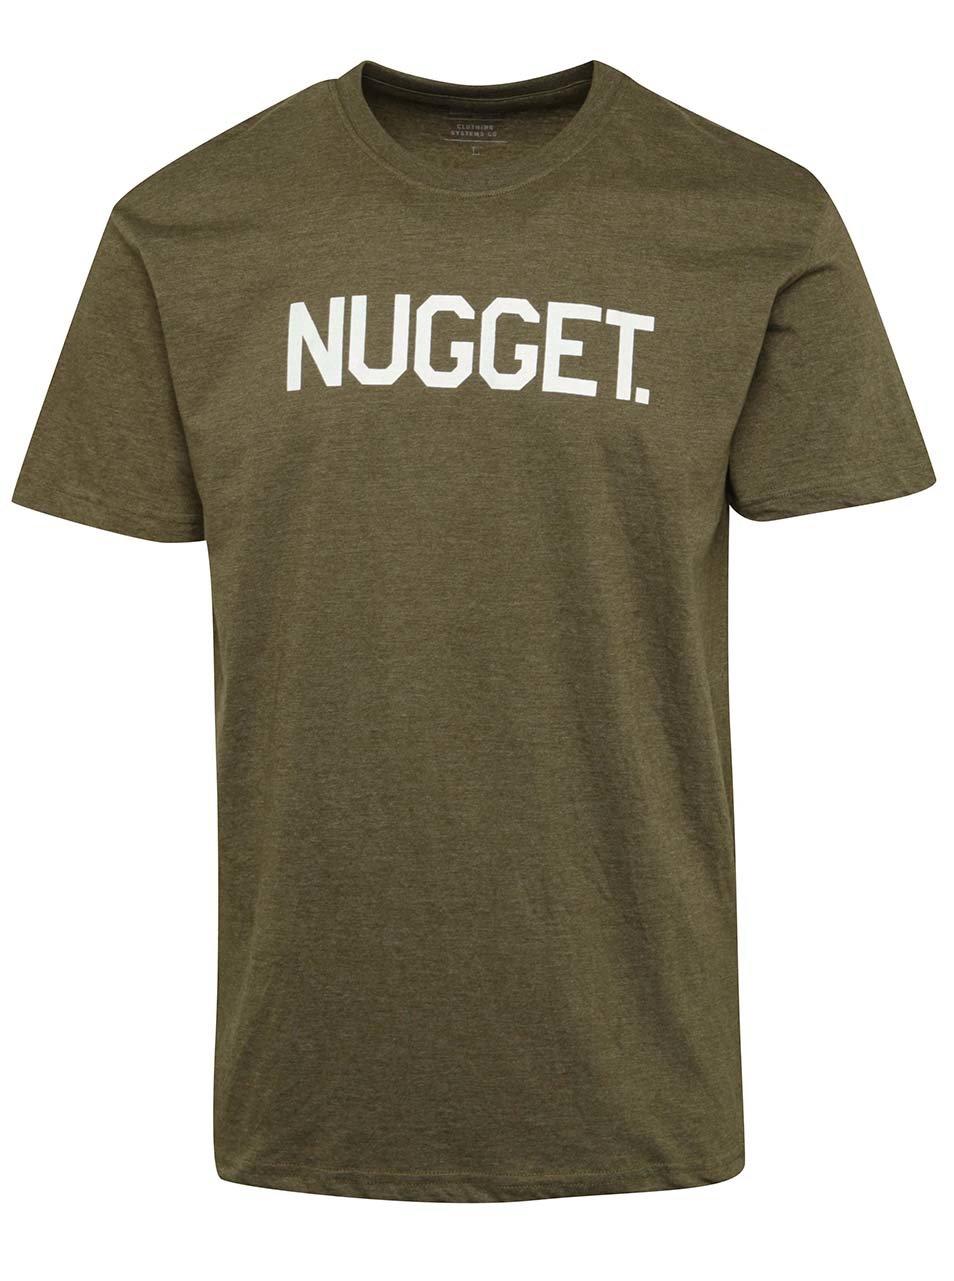 Khaki pánské triko s potiskem NUGGET Logo